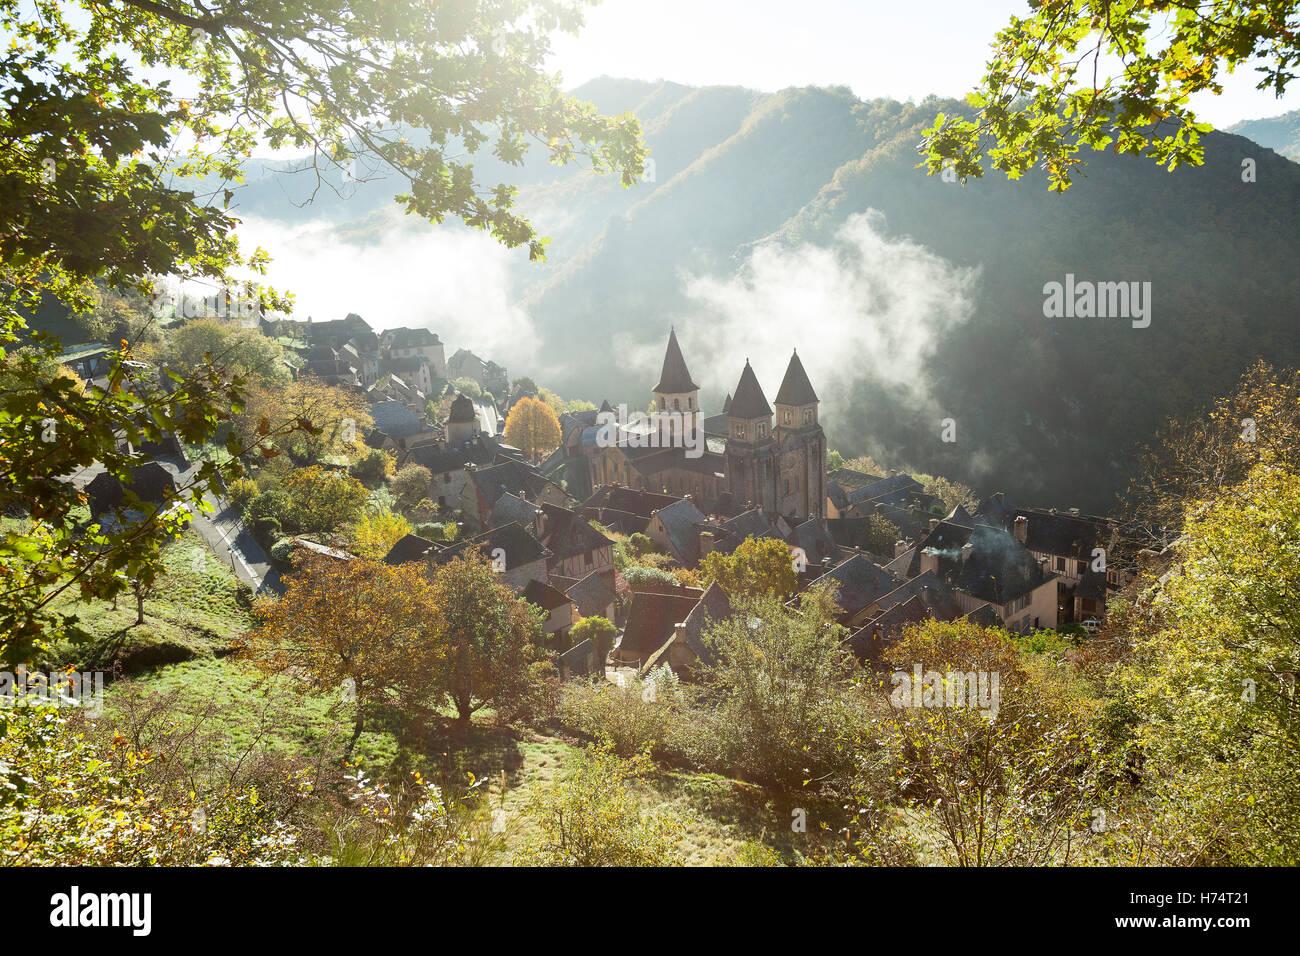 Un disparo de alto ángulo de Conques (Francia), por una brumosa mañana otoñal. Plongée Contre-sur Conques par onu brumeux matin d'Automne. Foto de stock